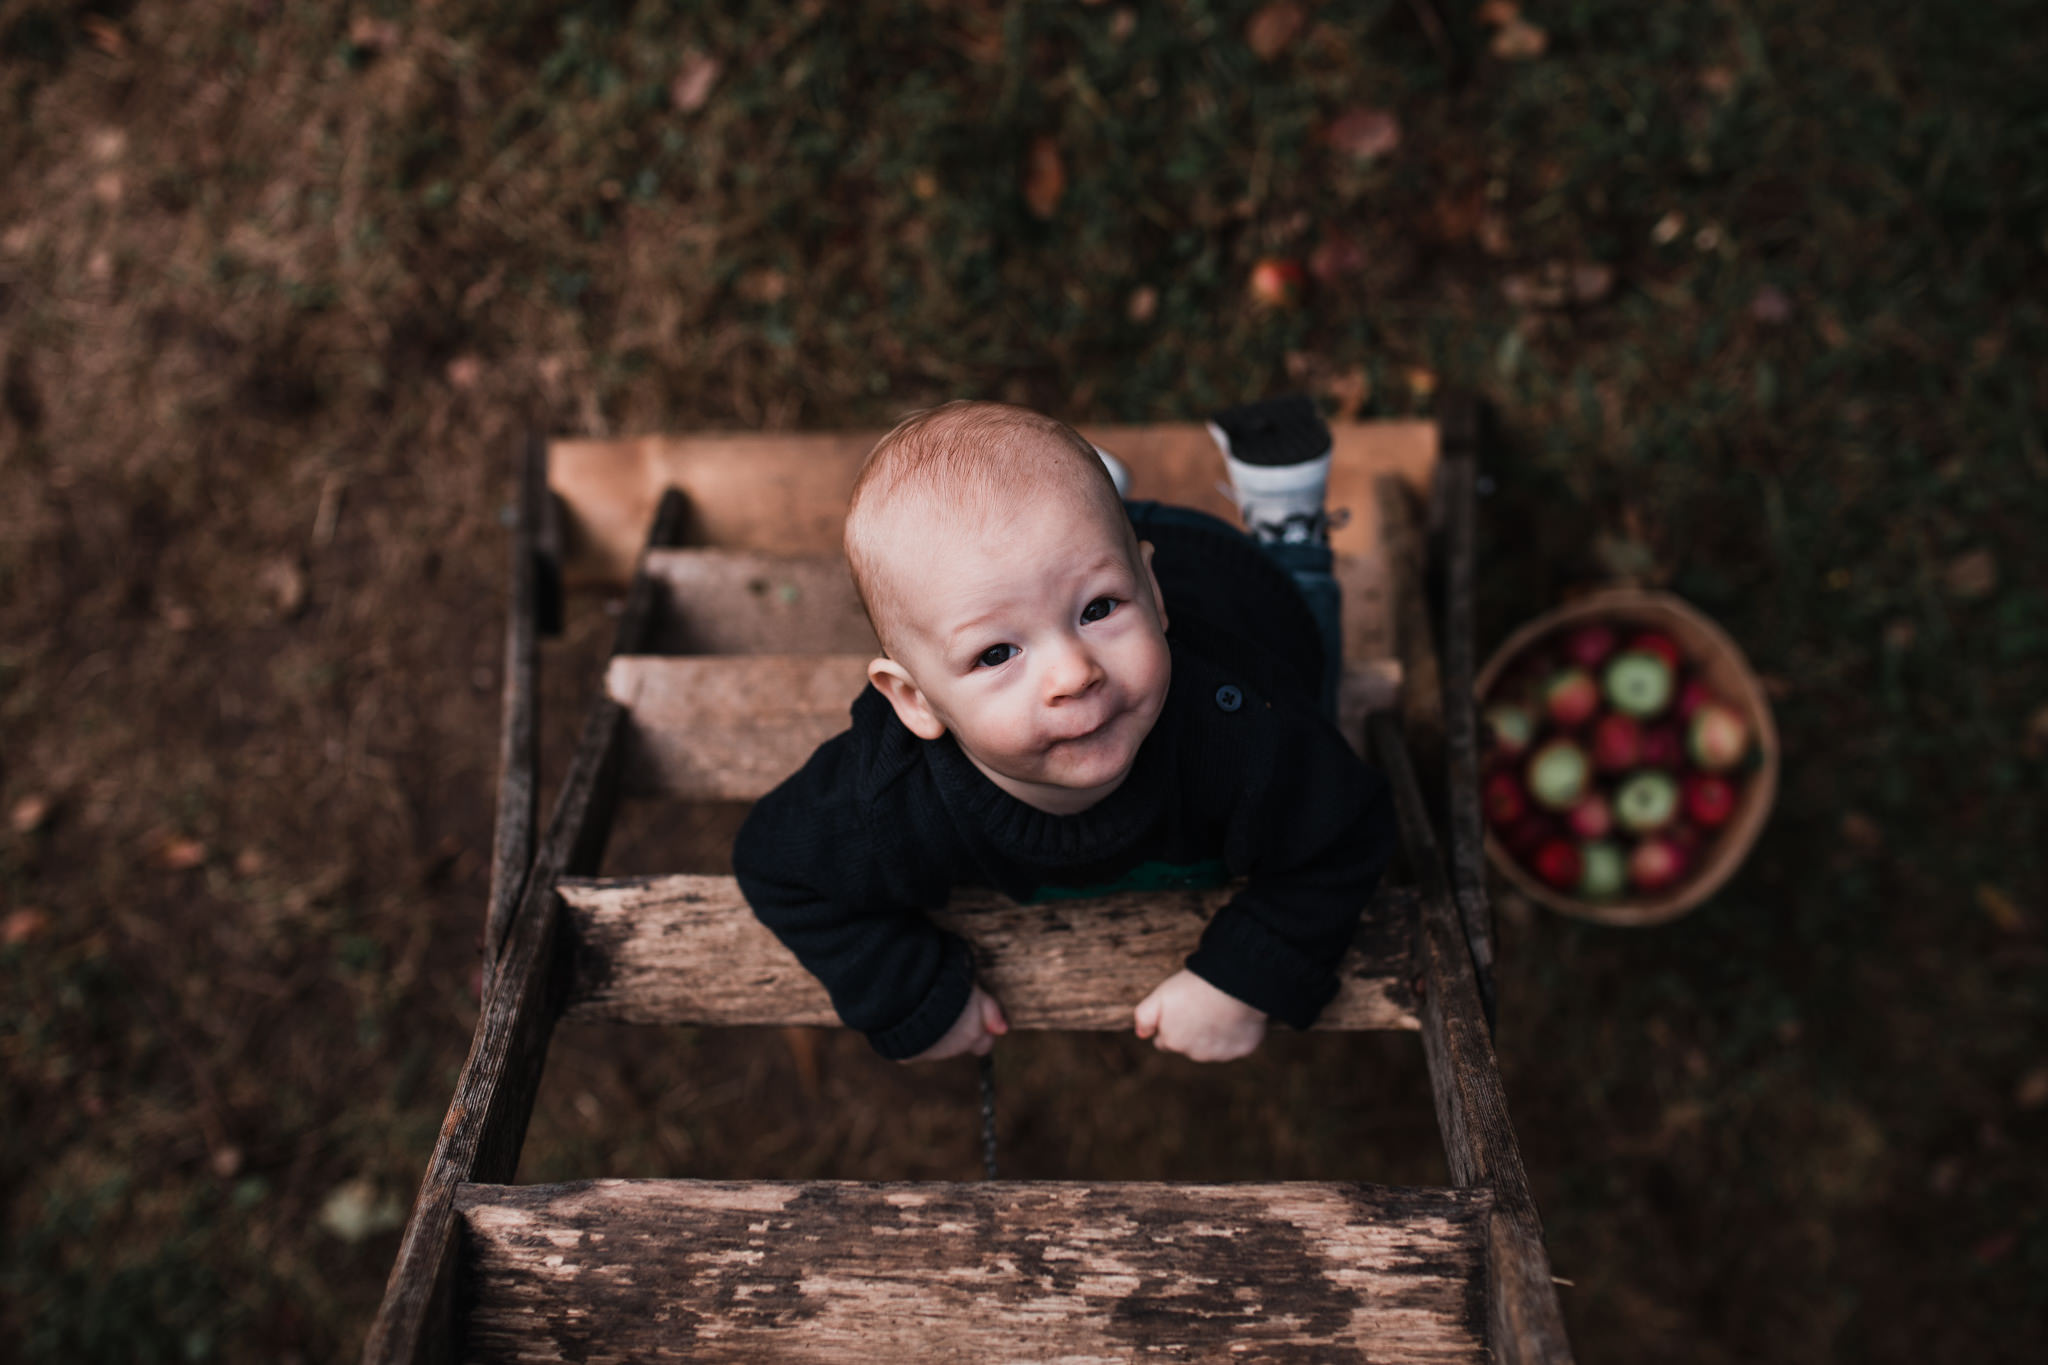 089-WEB-Jonathan-Kuhn-Photography-Elish-Nate-AppleOrchard-6900.jpg